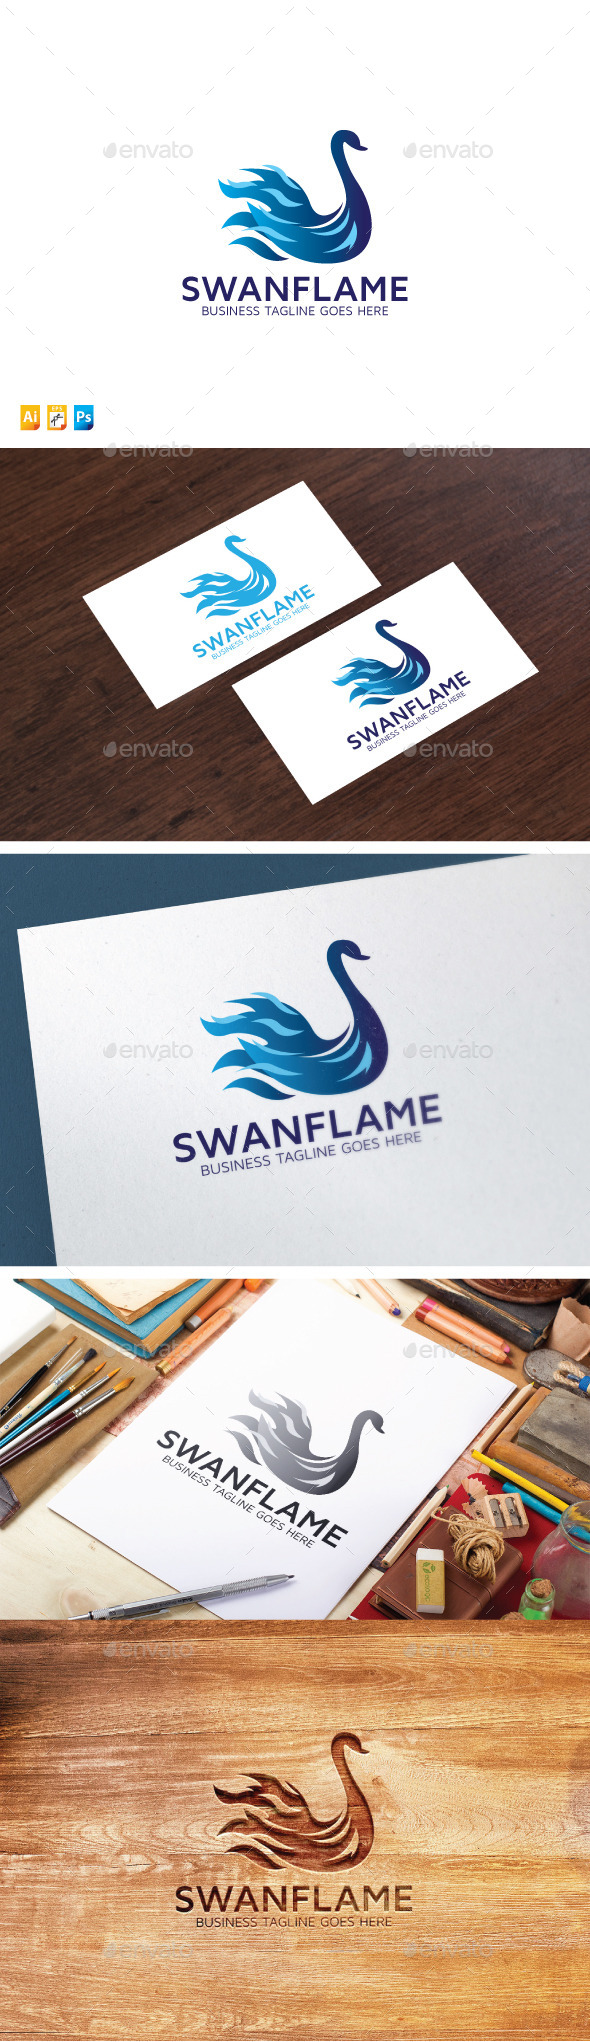 Swan Flame Logo - Animals Logo Templates